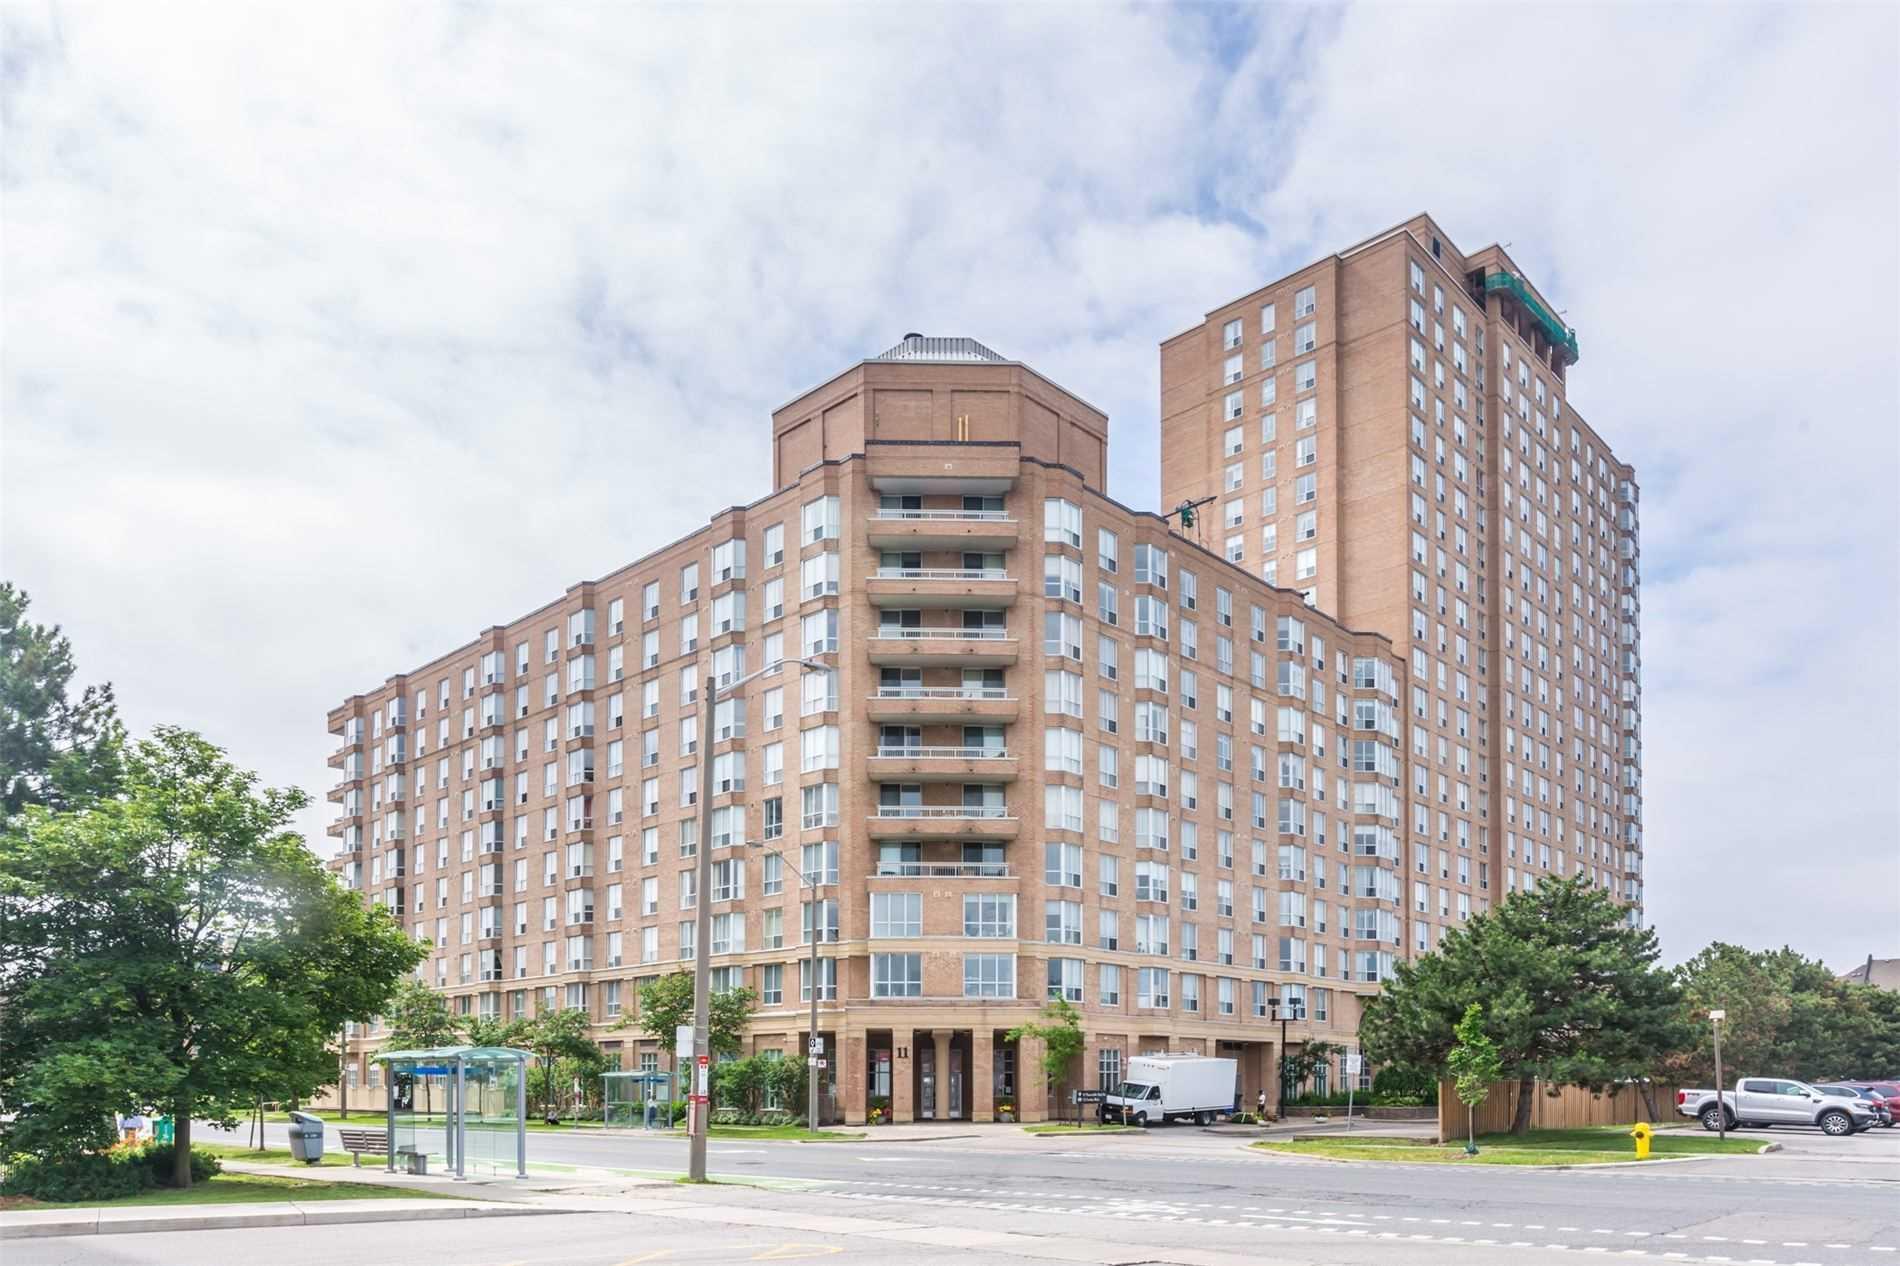 11 Thorncliffe Park Dr, Toronto, Ontario M4H1P3, 2 Bedrooms Bedrooms, 5 Rooms Rooms,2 BathroomsBathrooms,Condo Apt,For Sale,Thorncliffe Park,C5397712